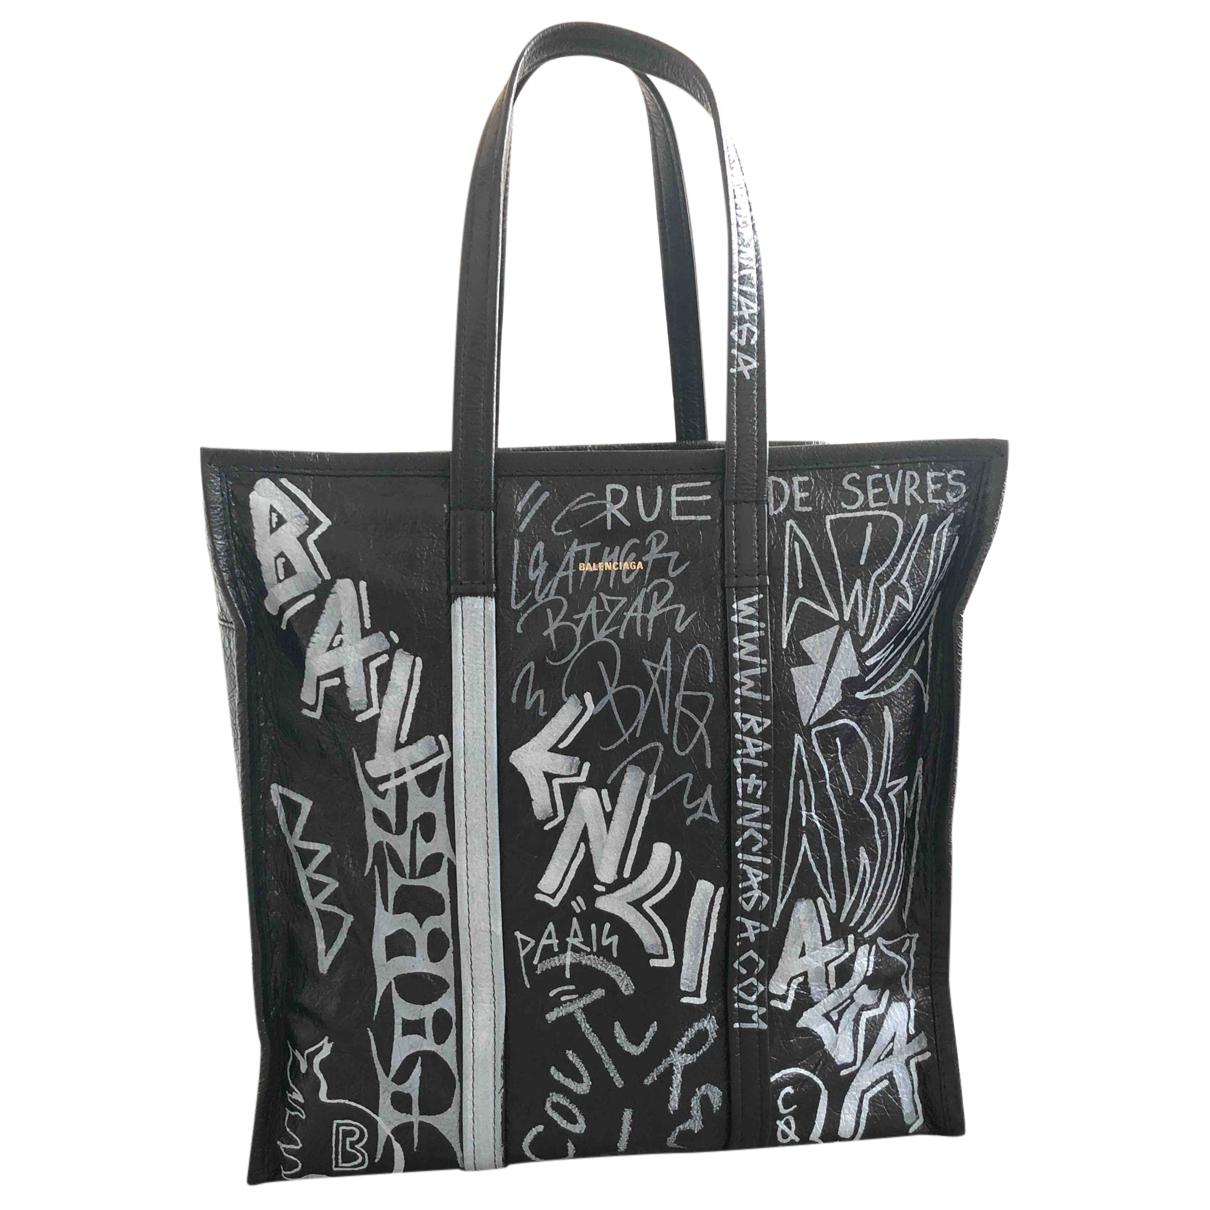 Balenciaga Bazar Bag Black Leather handbag for Women N